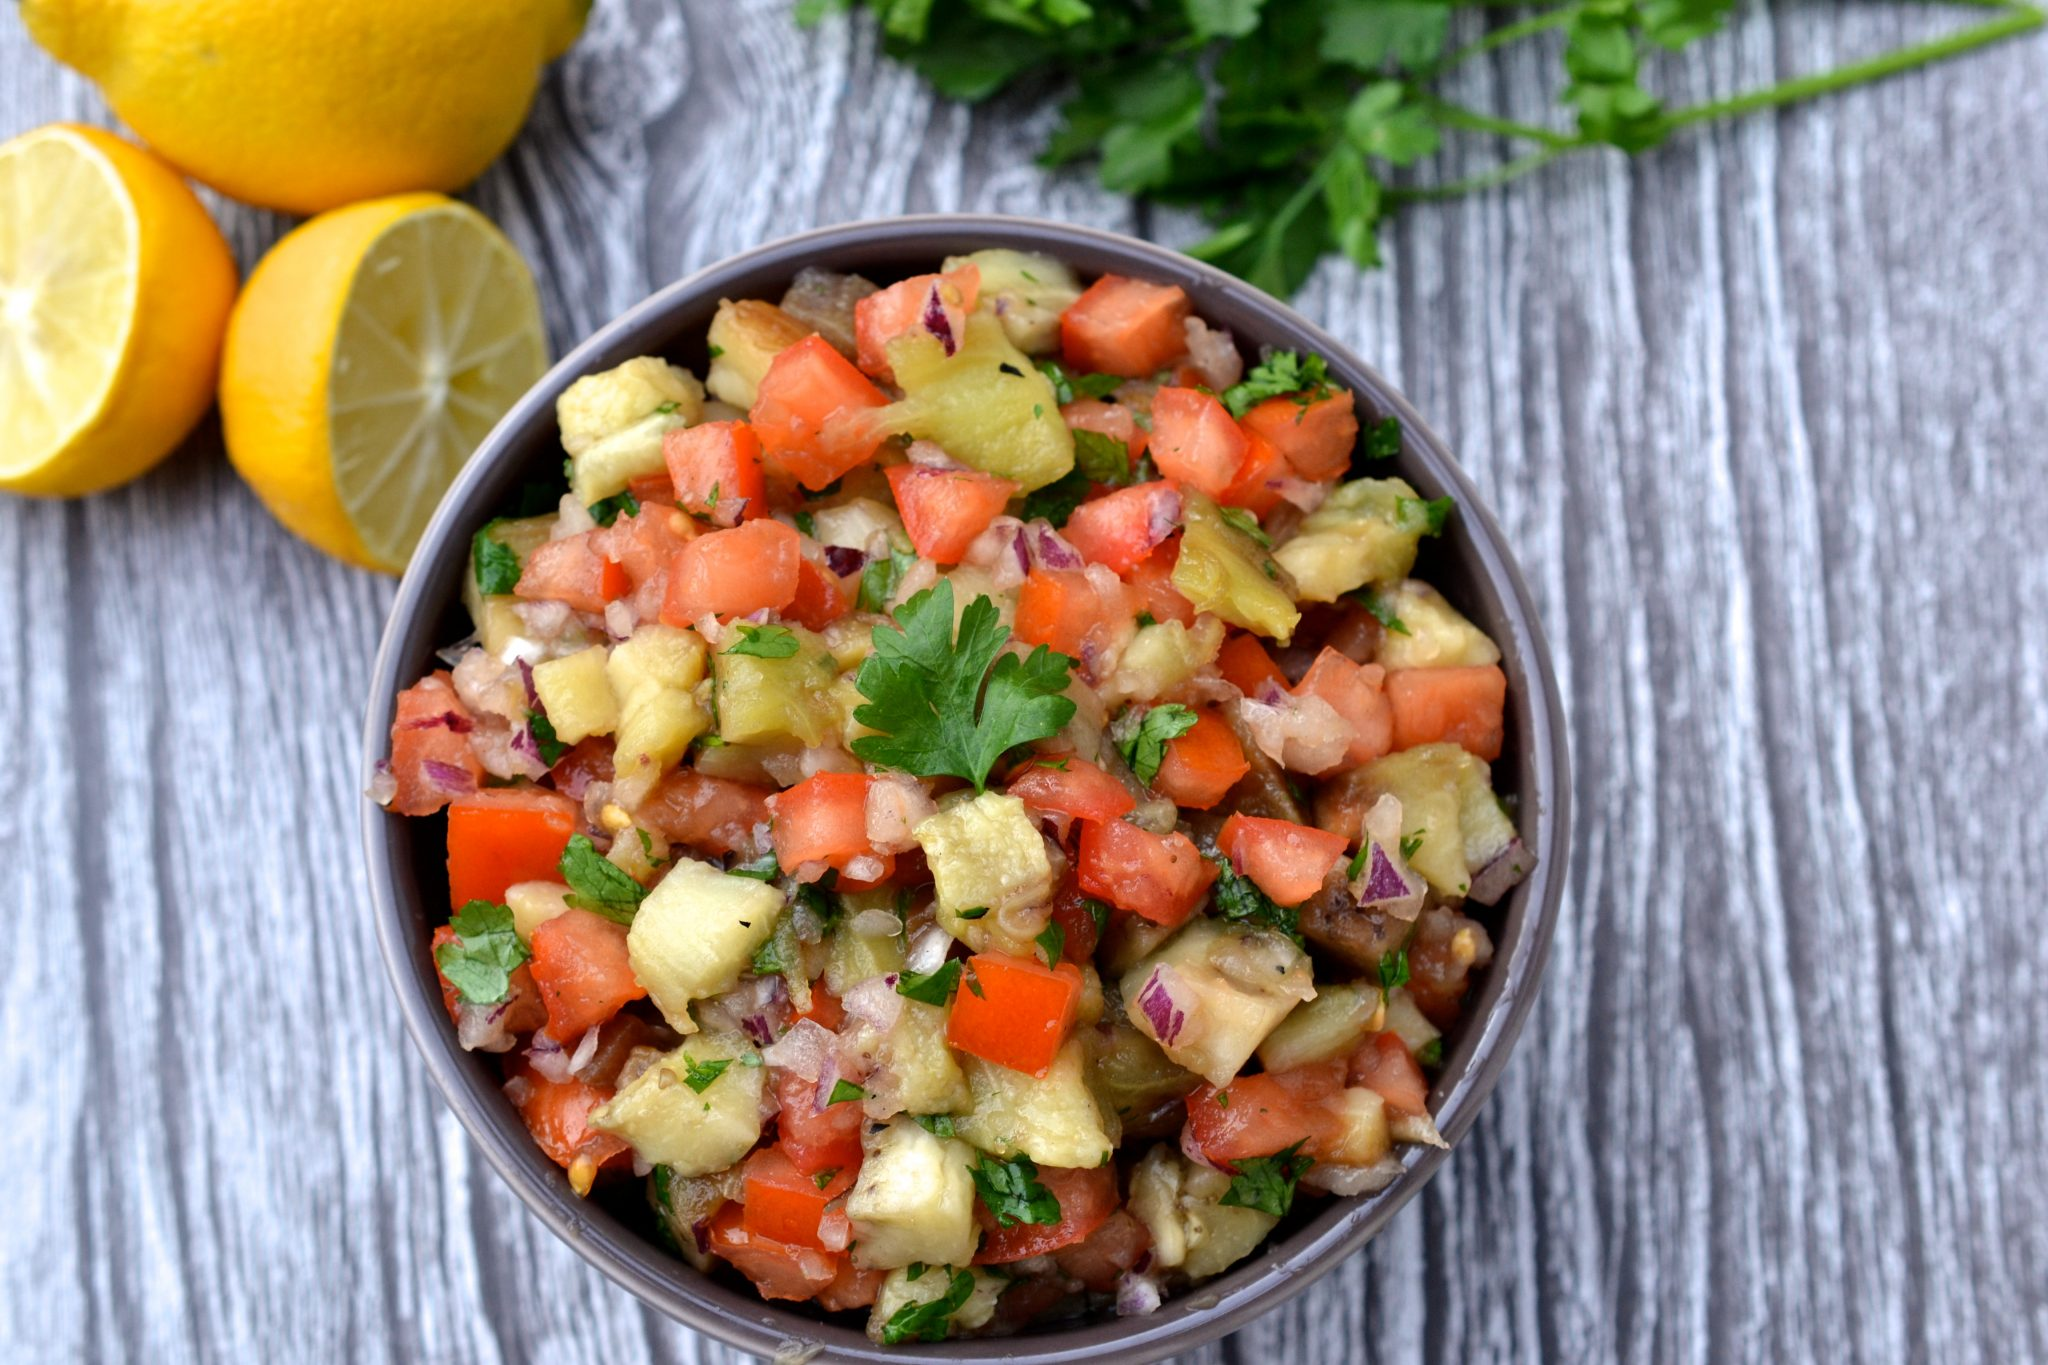 Smoky Eggplant & Tomato Salad | Every Last Bite